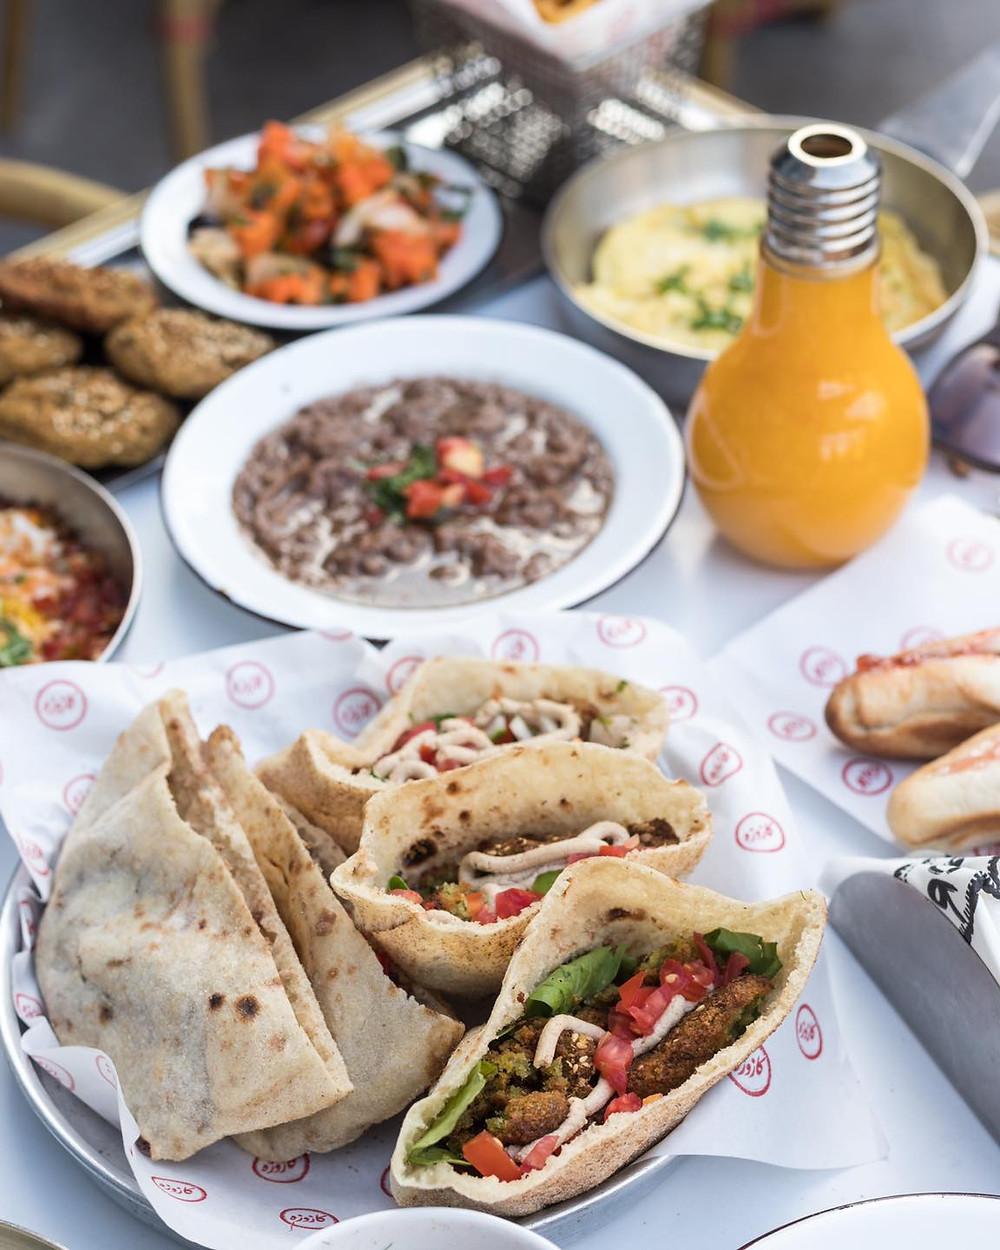 Kazouza. Best Breakfast, Brunch and Bakeries in Maadi